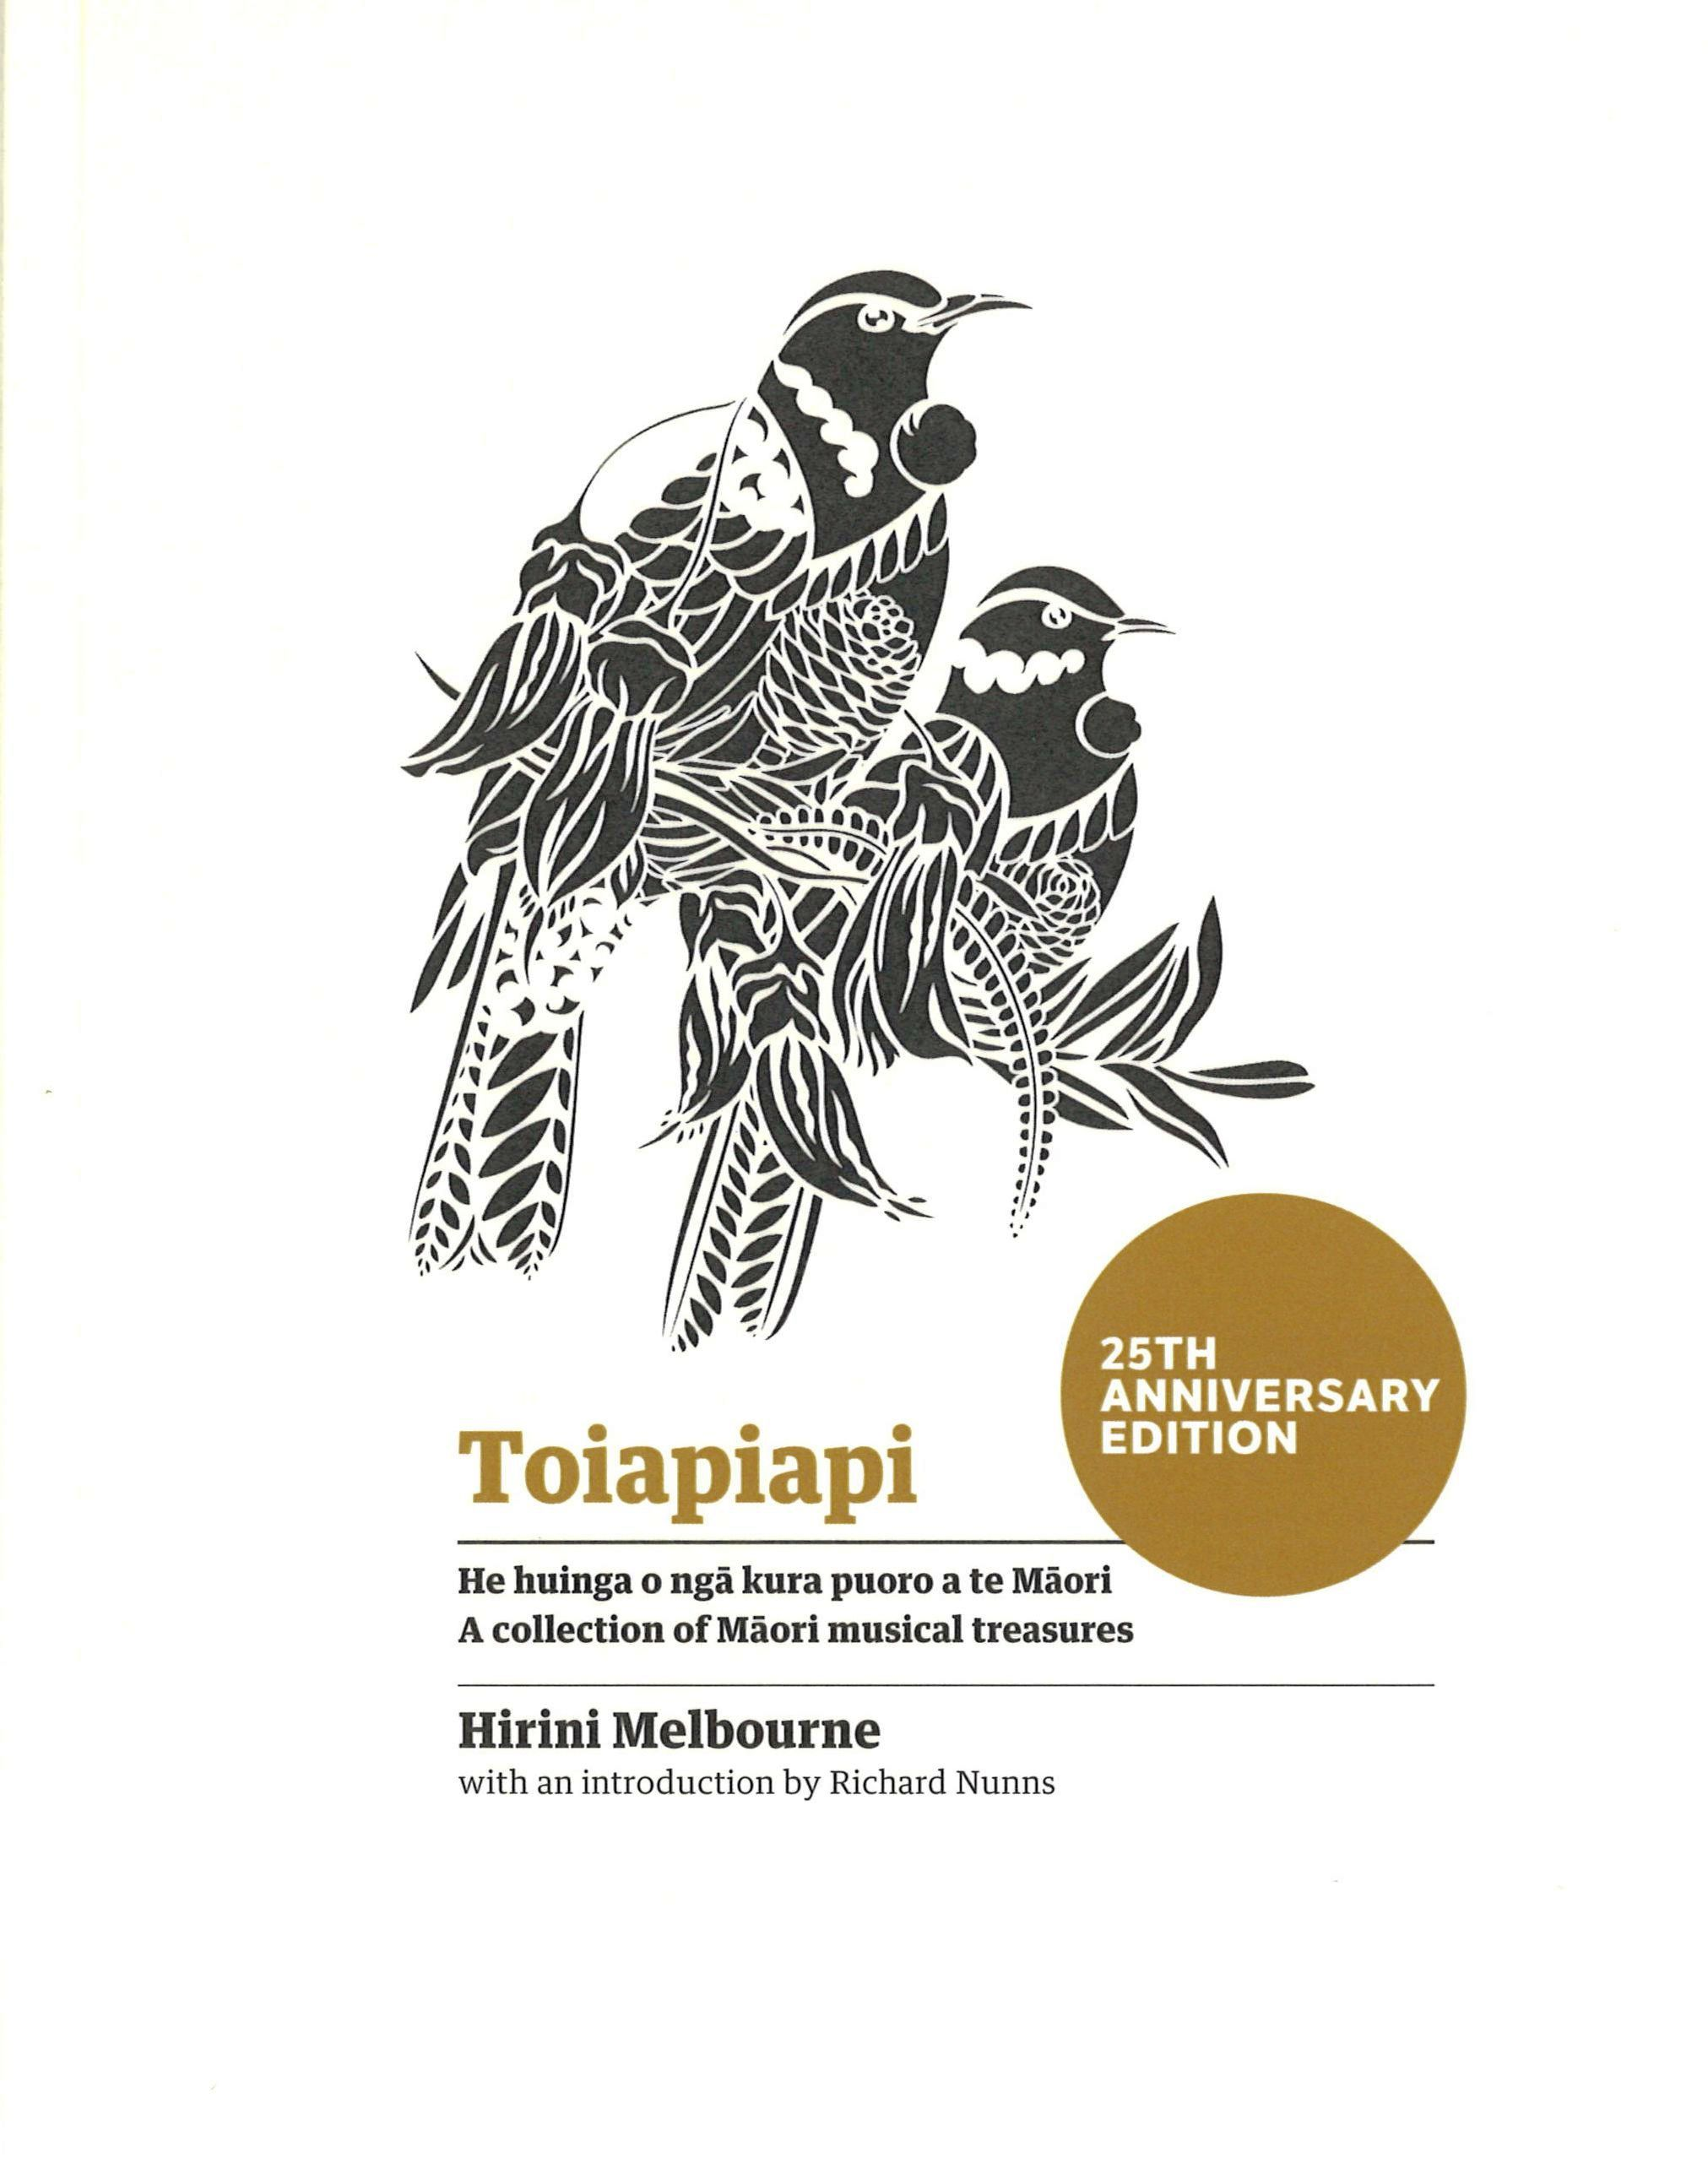 Toiapiapi – A Collection Of Maori Musical Treasures (CD & Book)